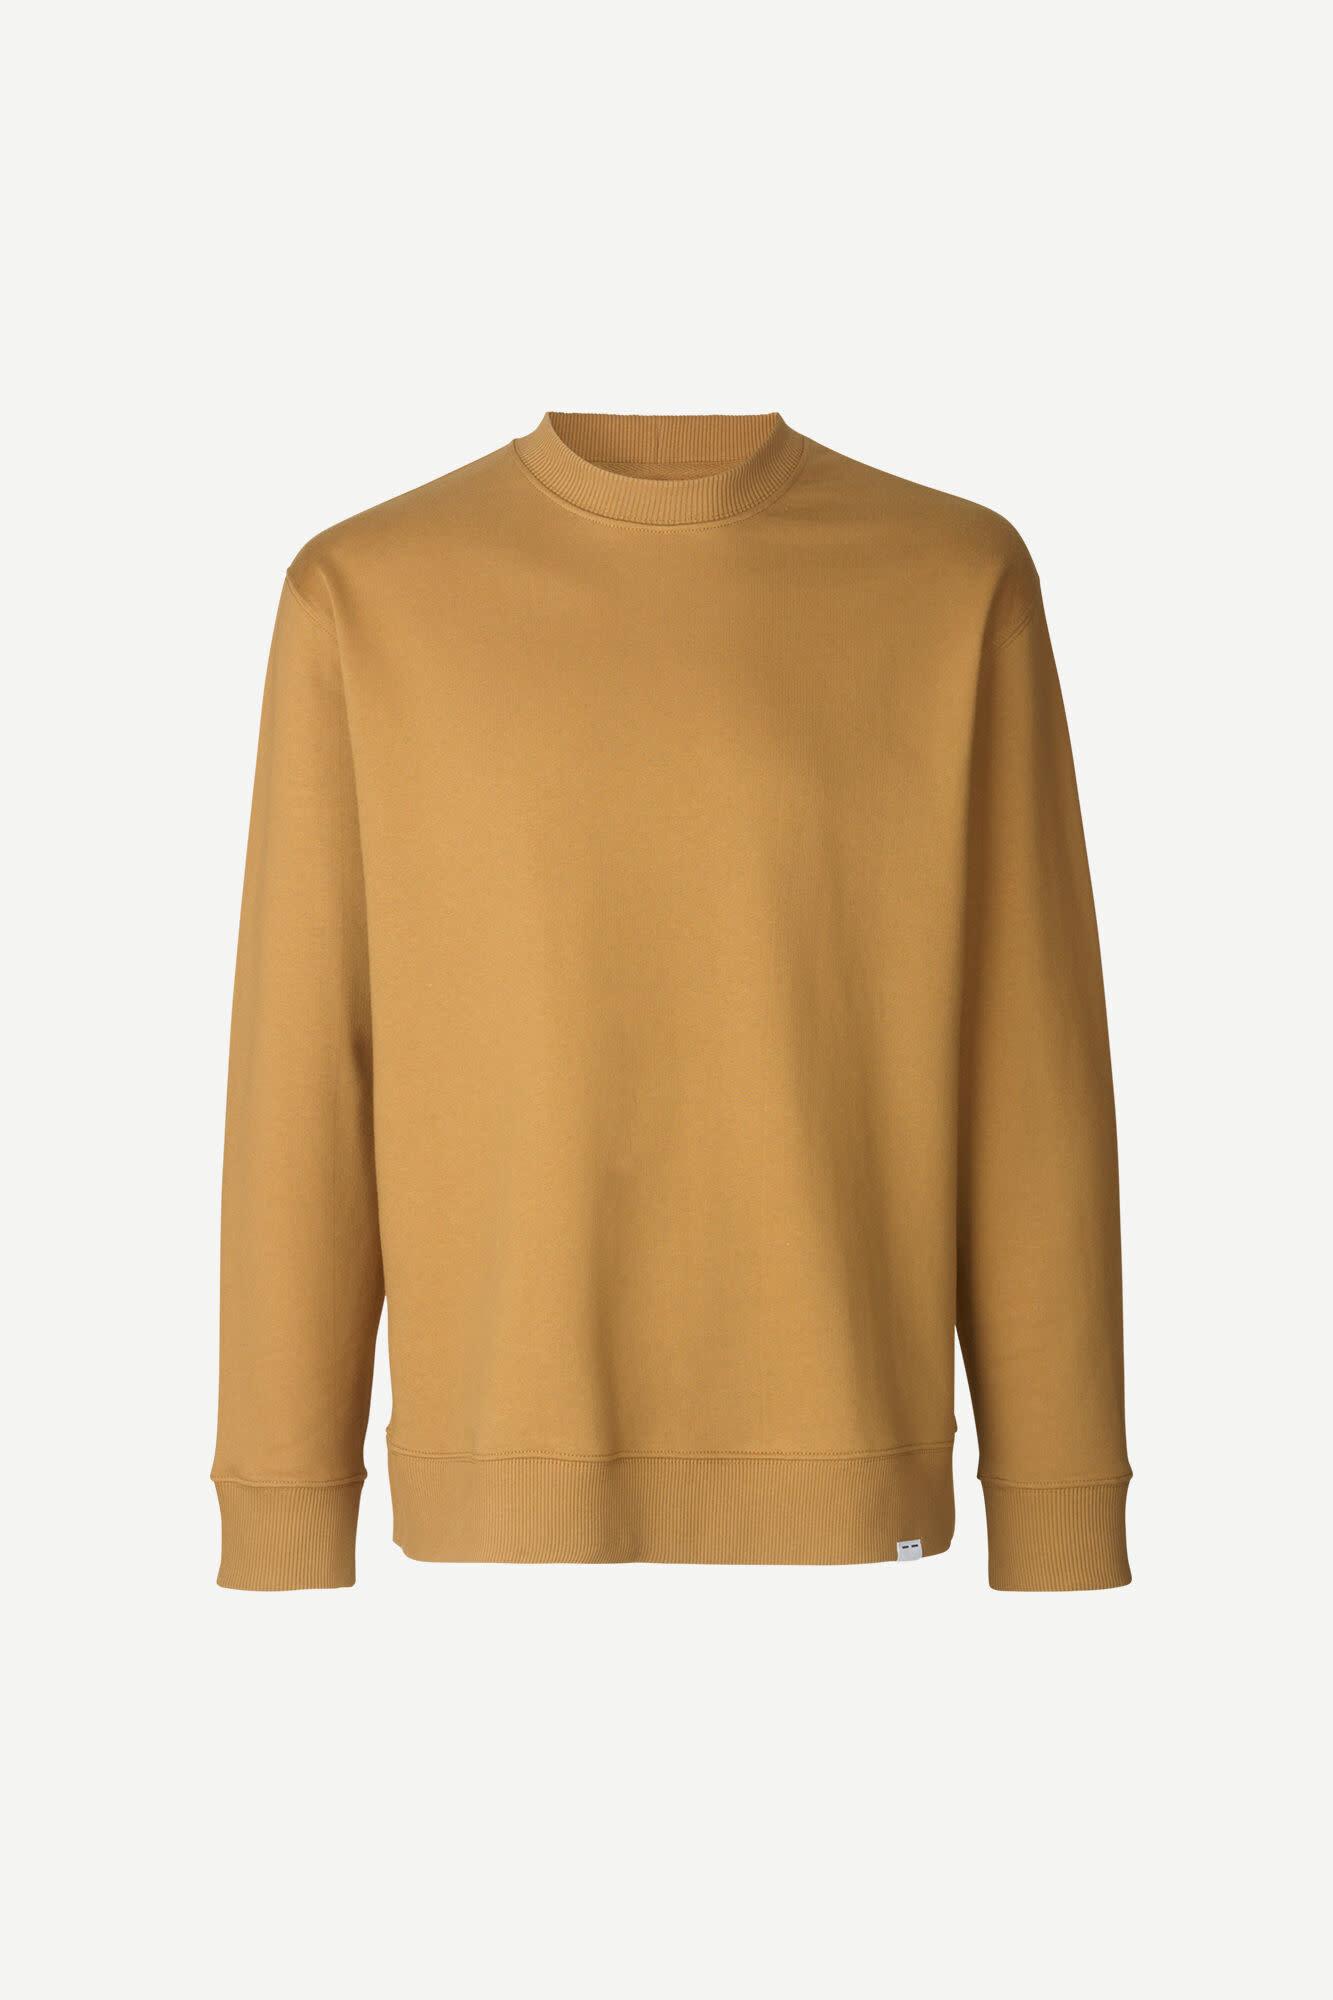 Toscan Sweatshirt Cumin Brown 11414-1